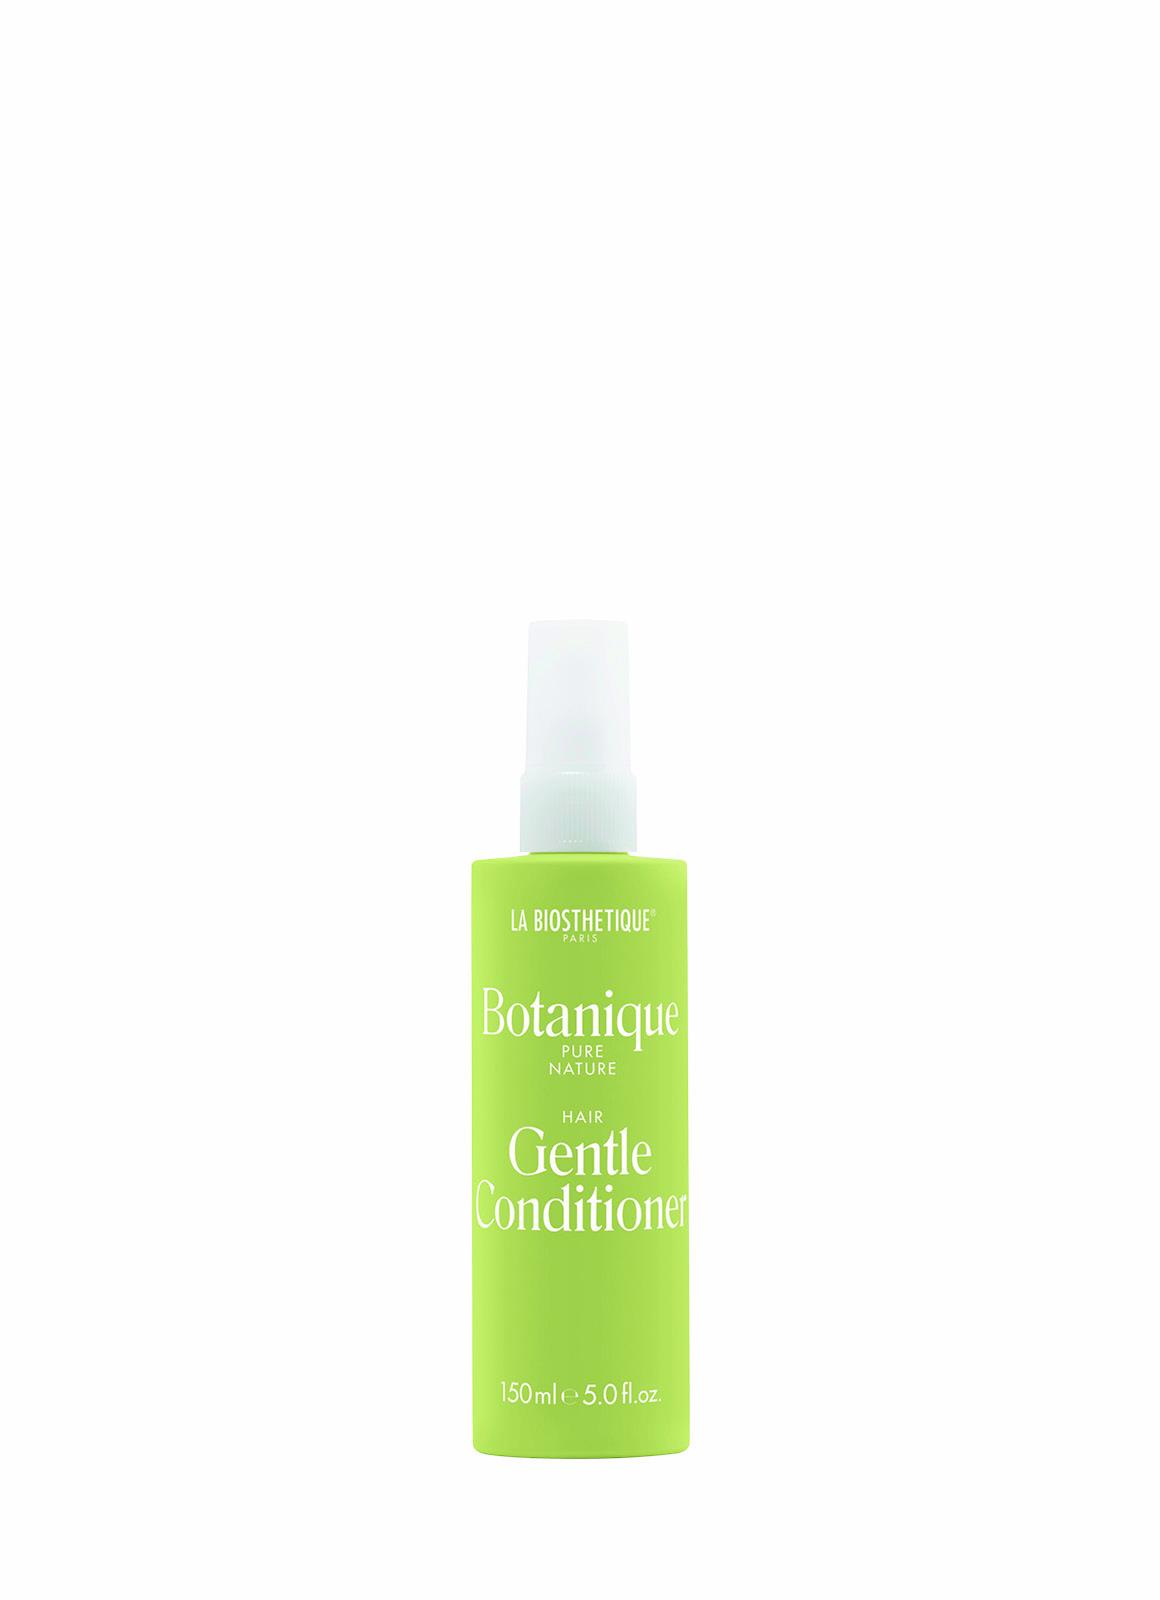 Hair Botanique Gentle Conditioner 150ml